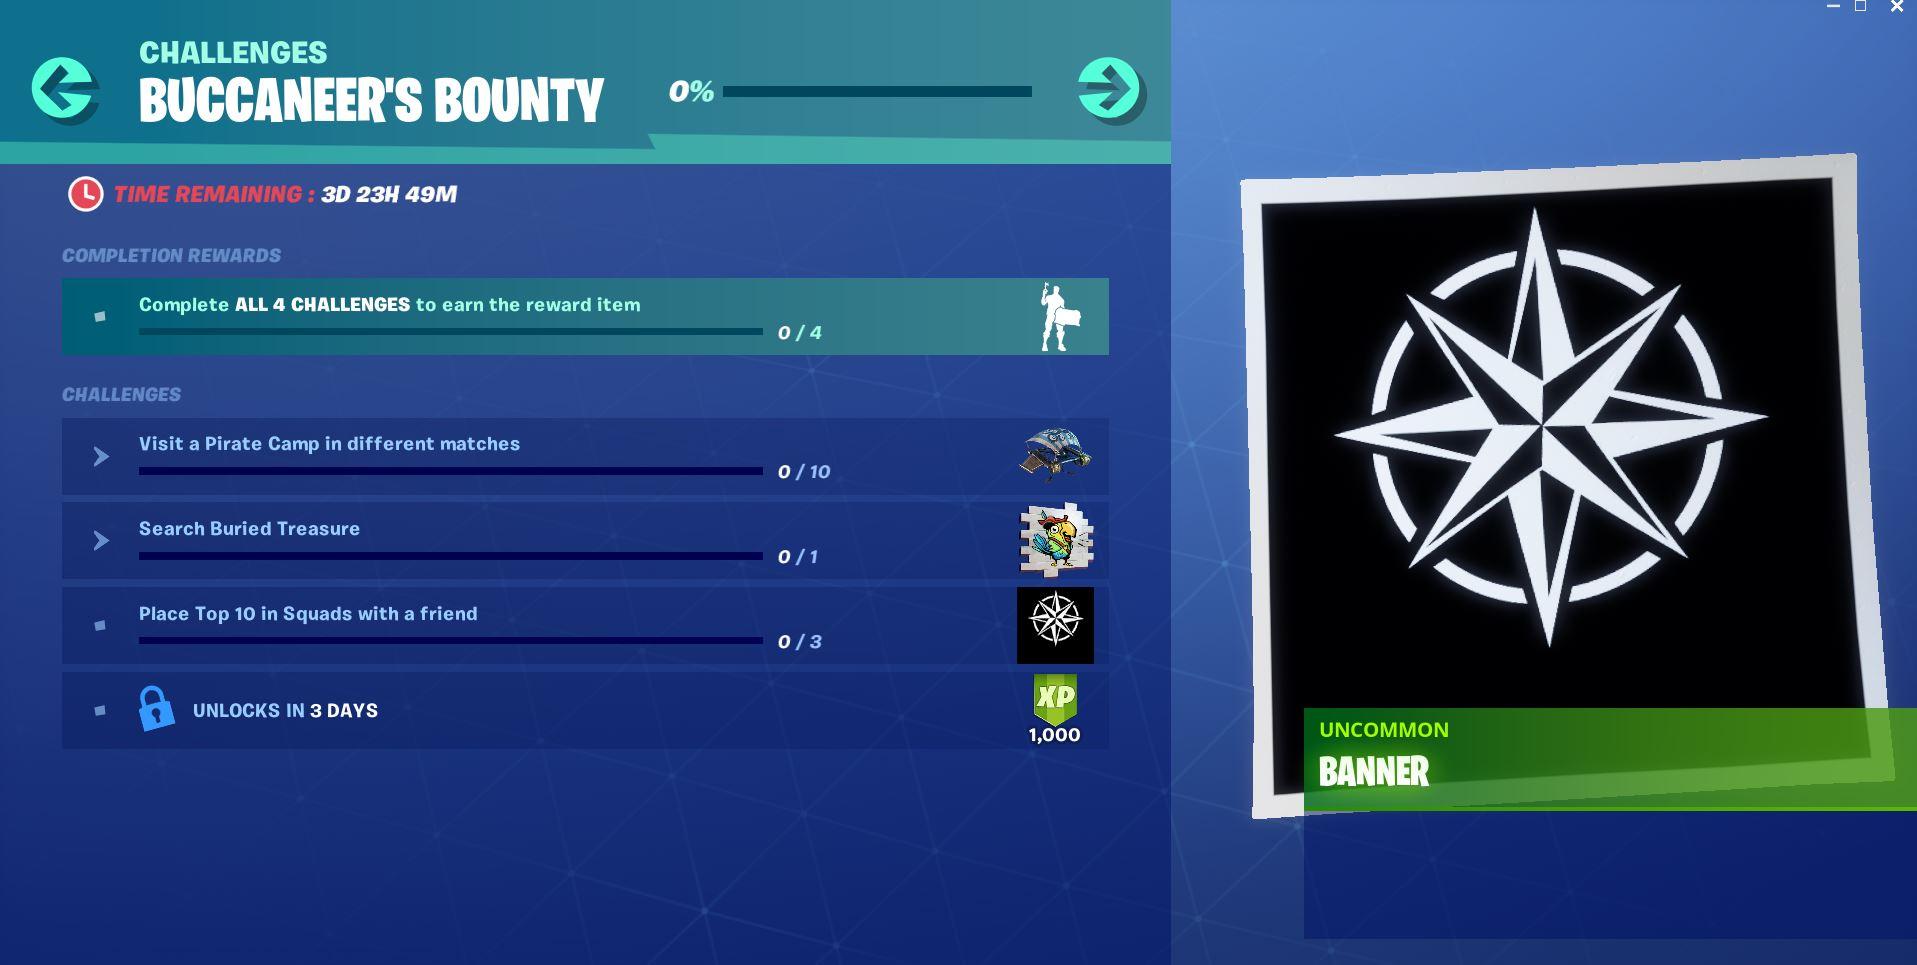 Buccaneers Bounty Challenge and Reward - Day 3